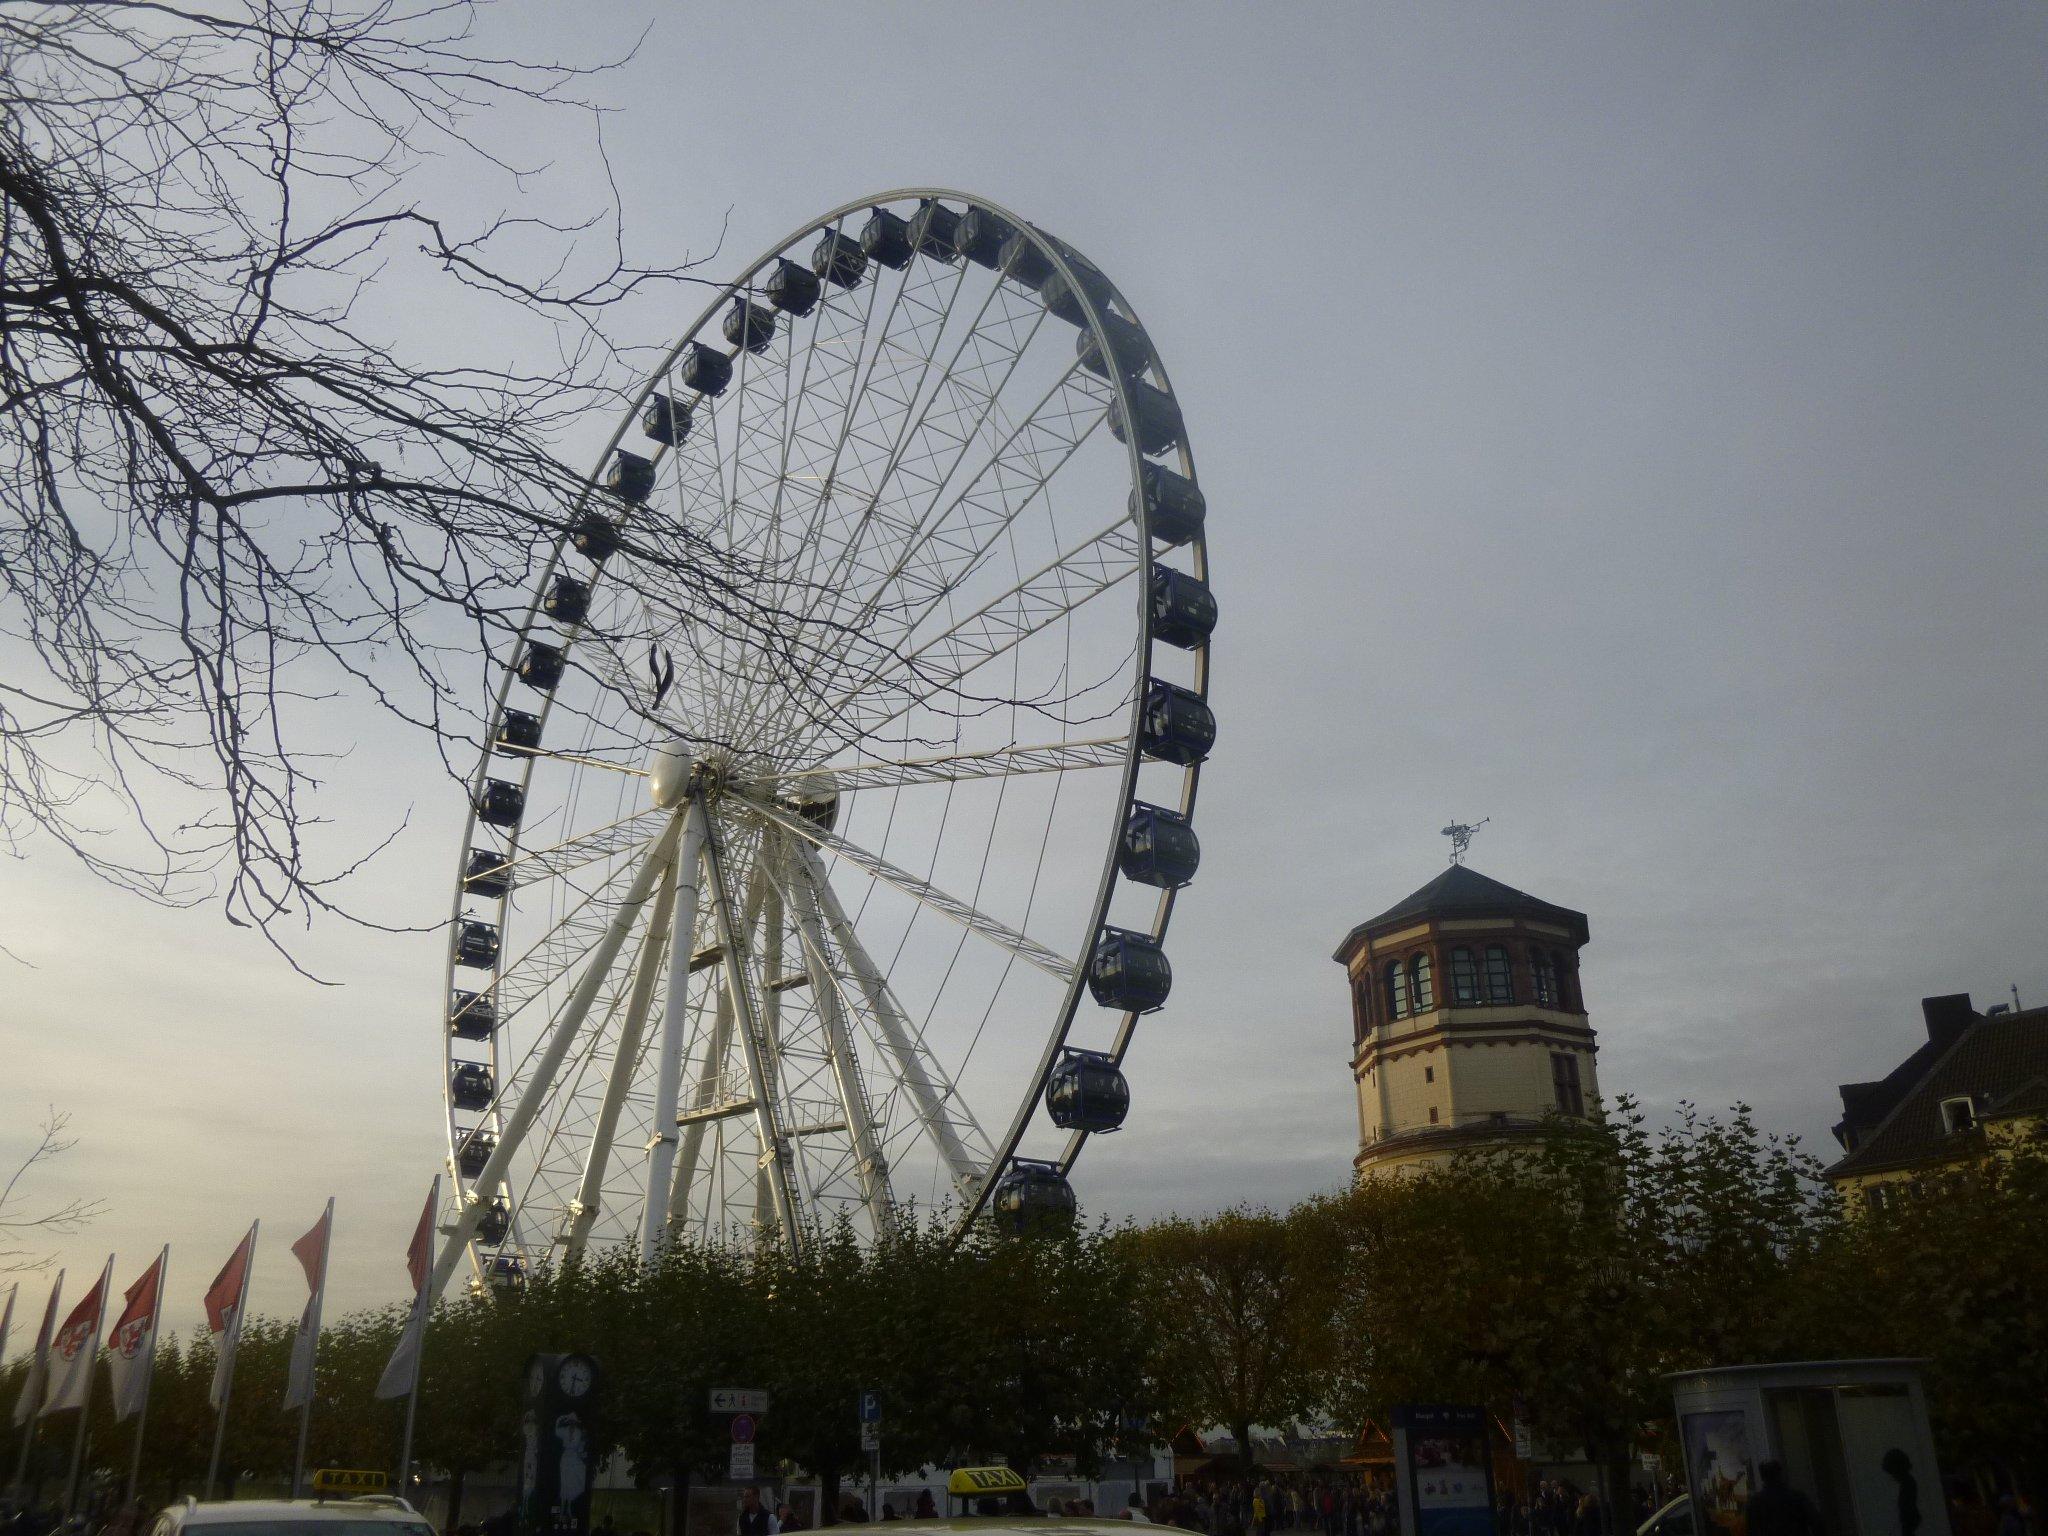 Riesenrad + Schlossturm